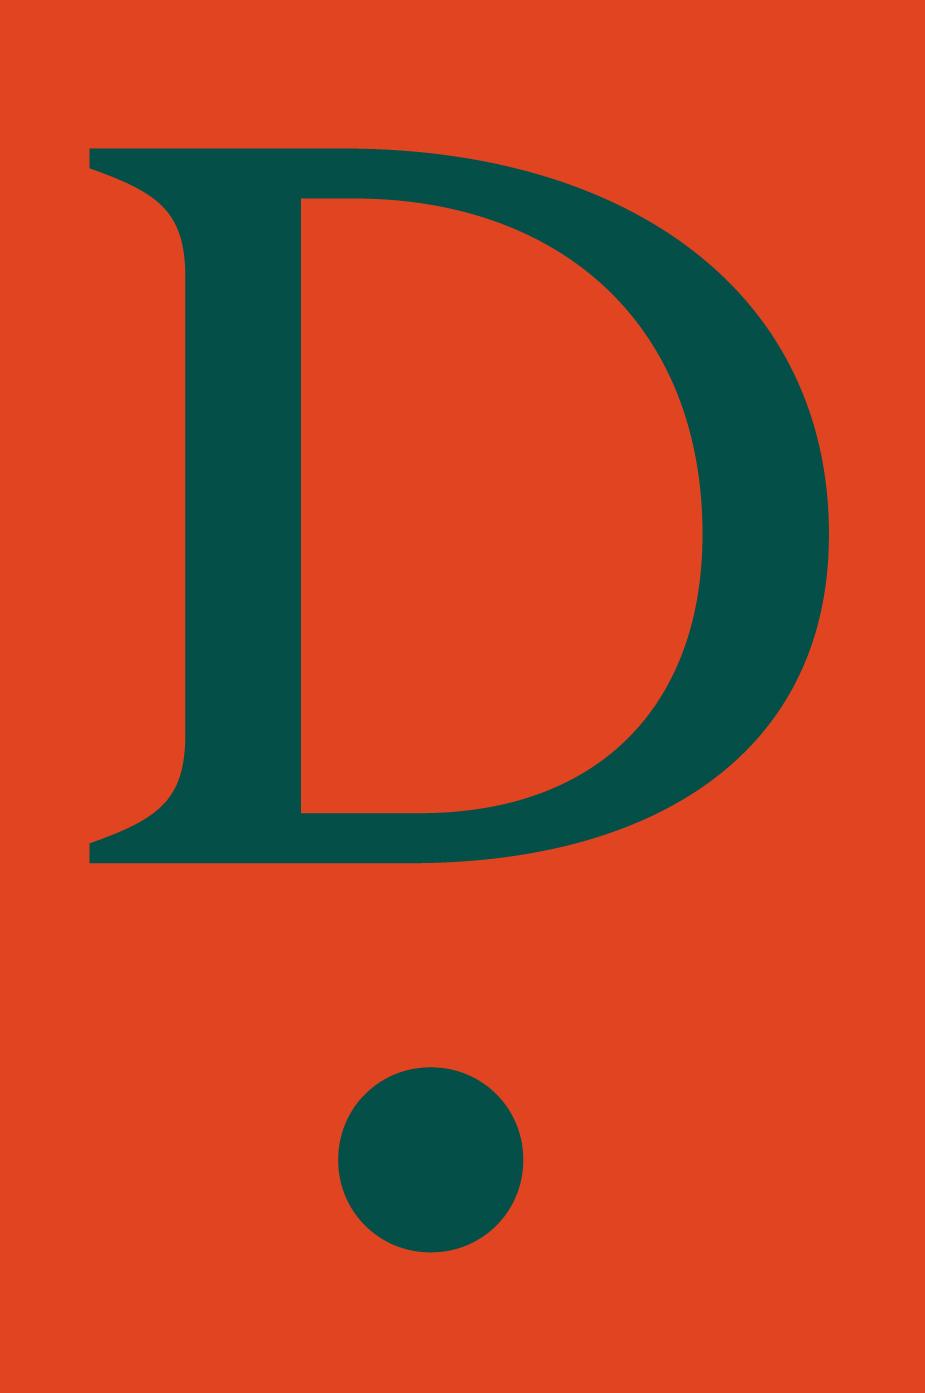 Trafalgar denarius